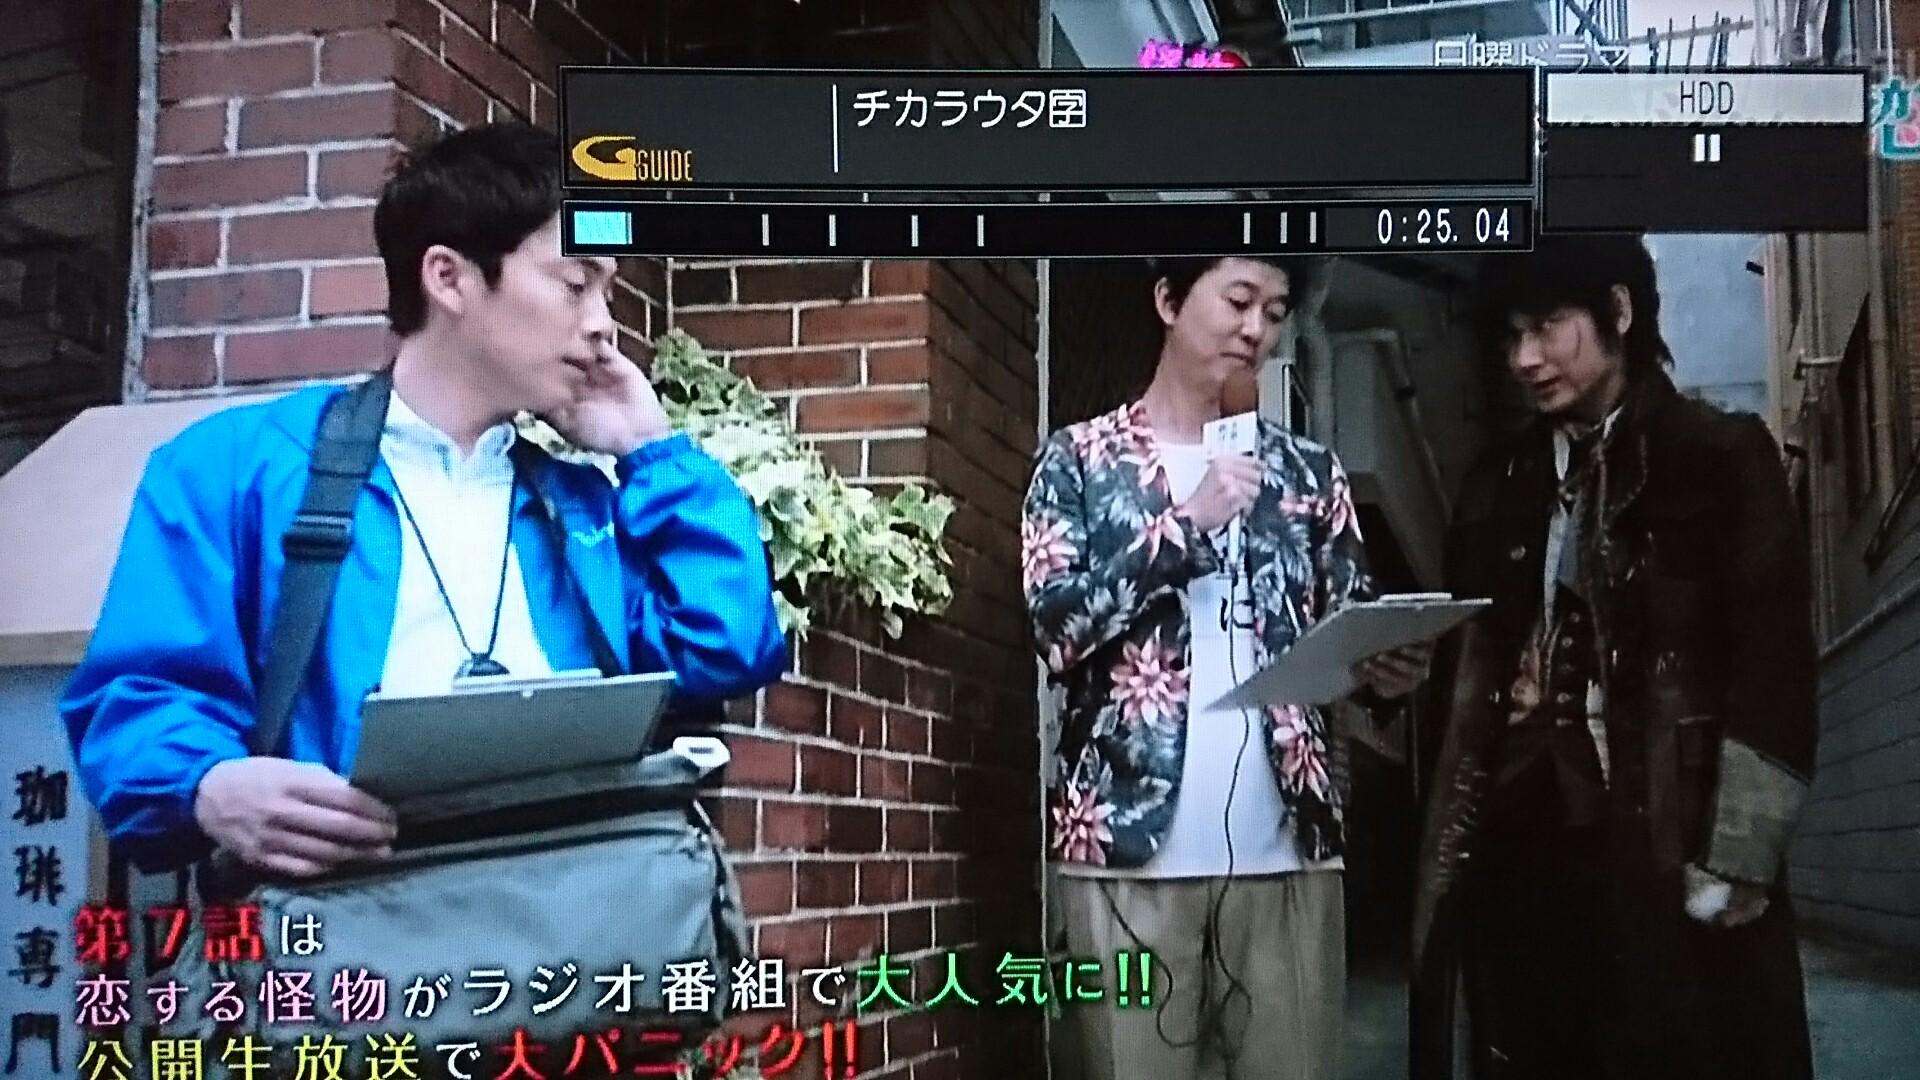 f:id:sunflower-shigeaki:20170606234744j:image